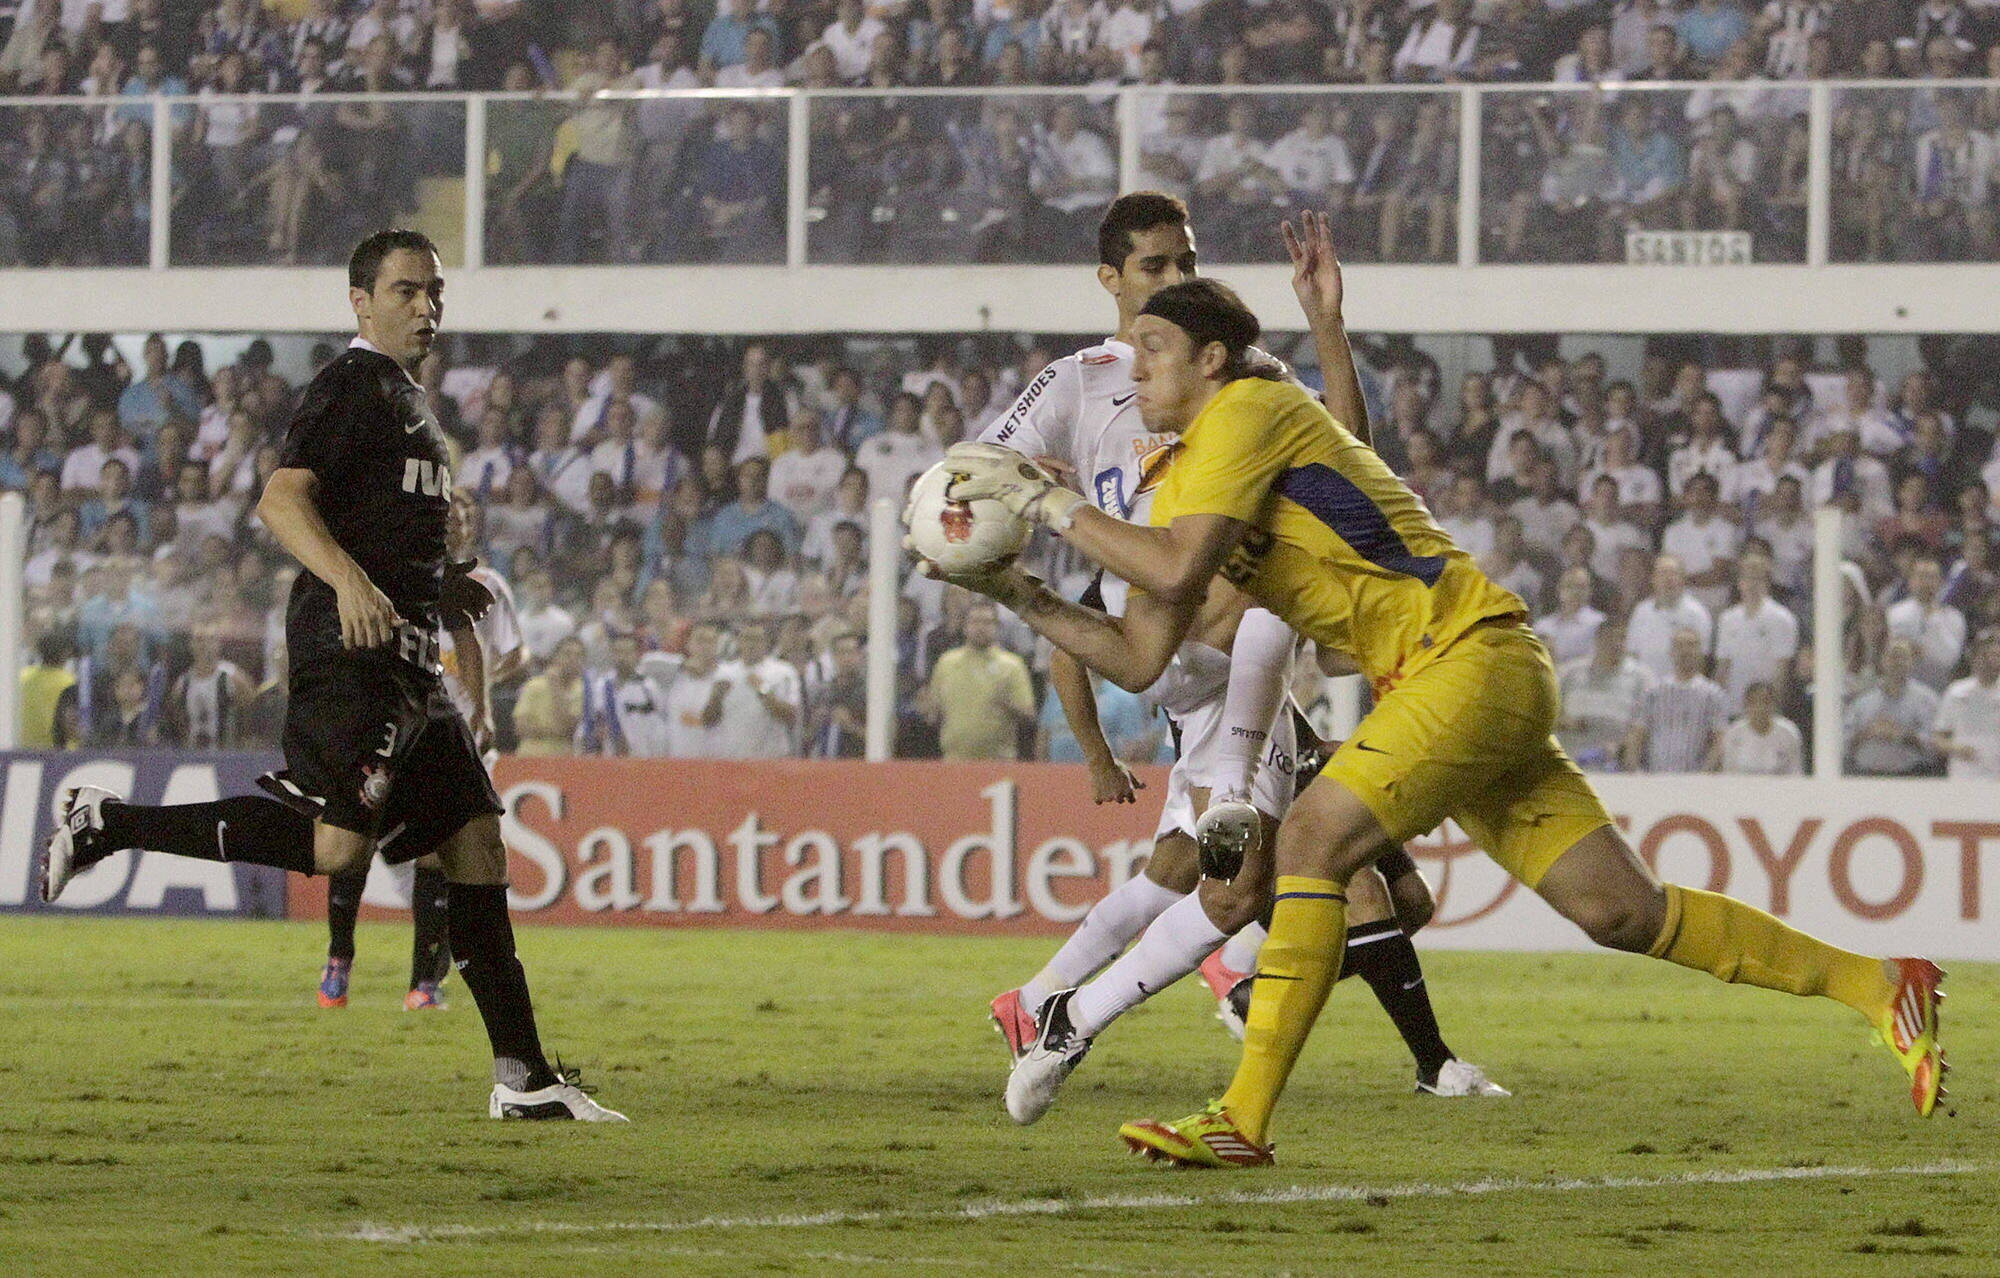 A queda no estadual levou Tite a promover Cássio como goleiro titular nos mata-mata da Libertadores. Foto: EFE